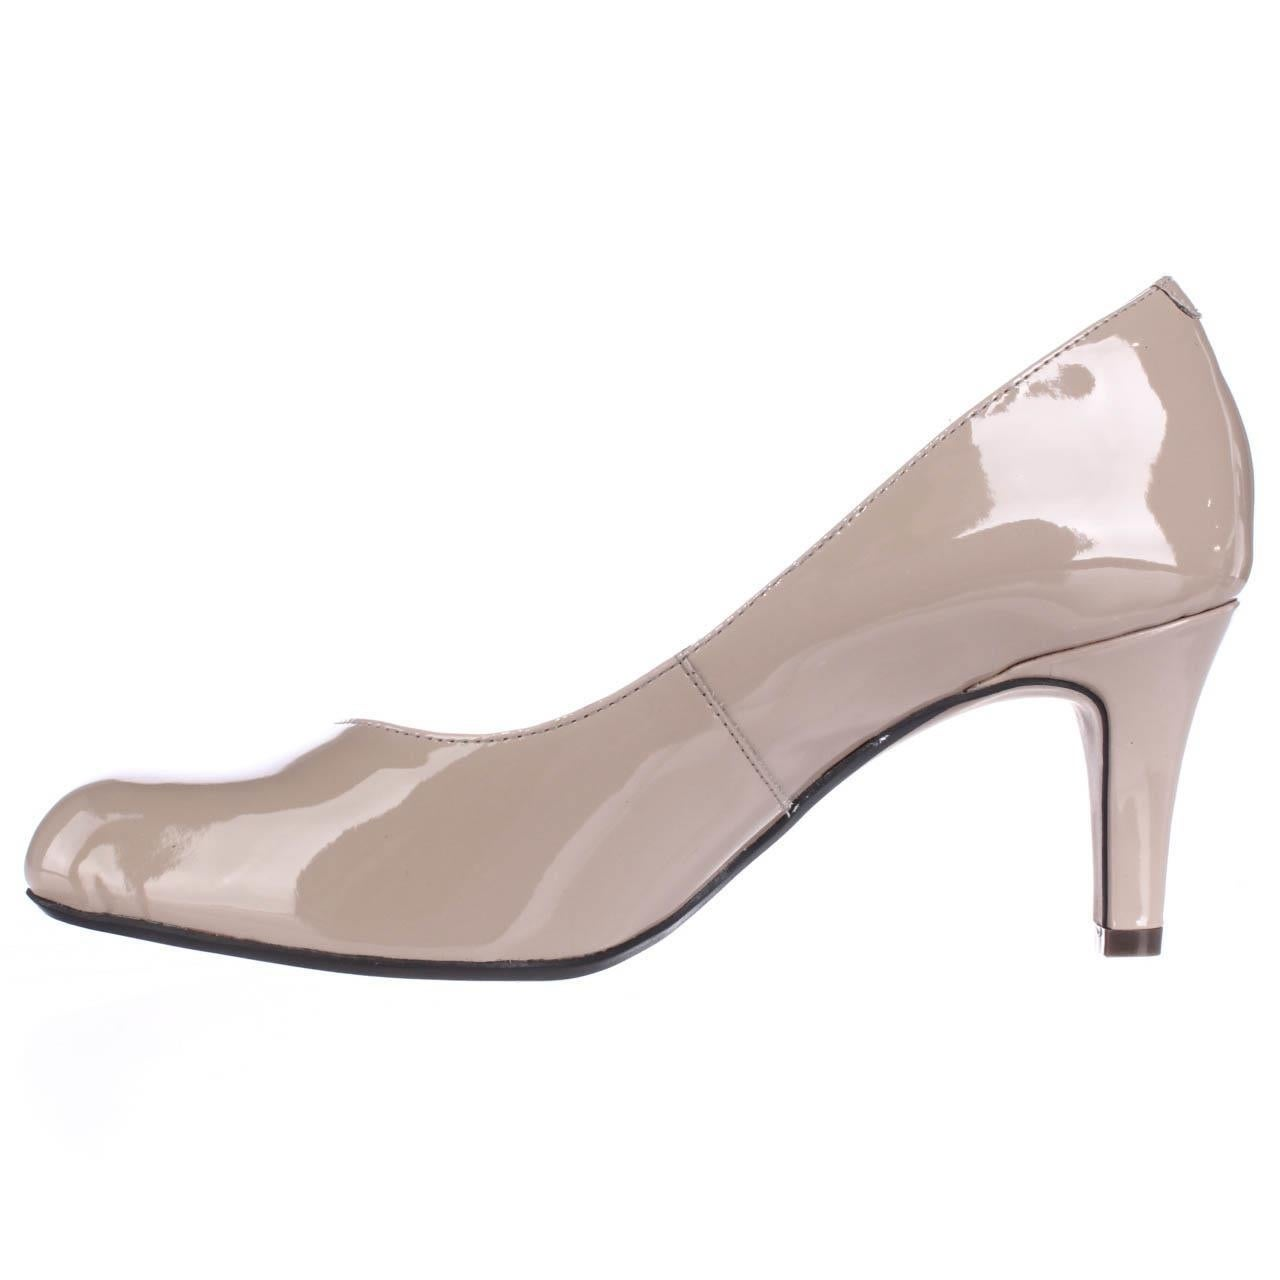 ca2cec158 Shop Clarks Arista Abe Comfort Dress Pumps